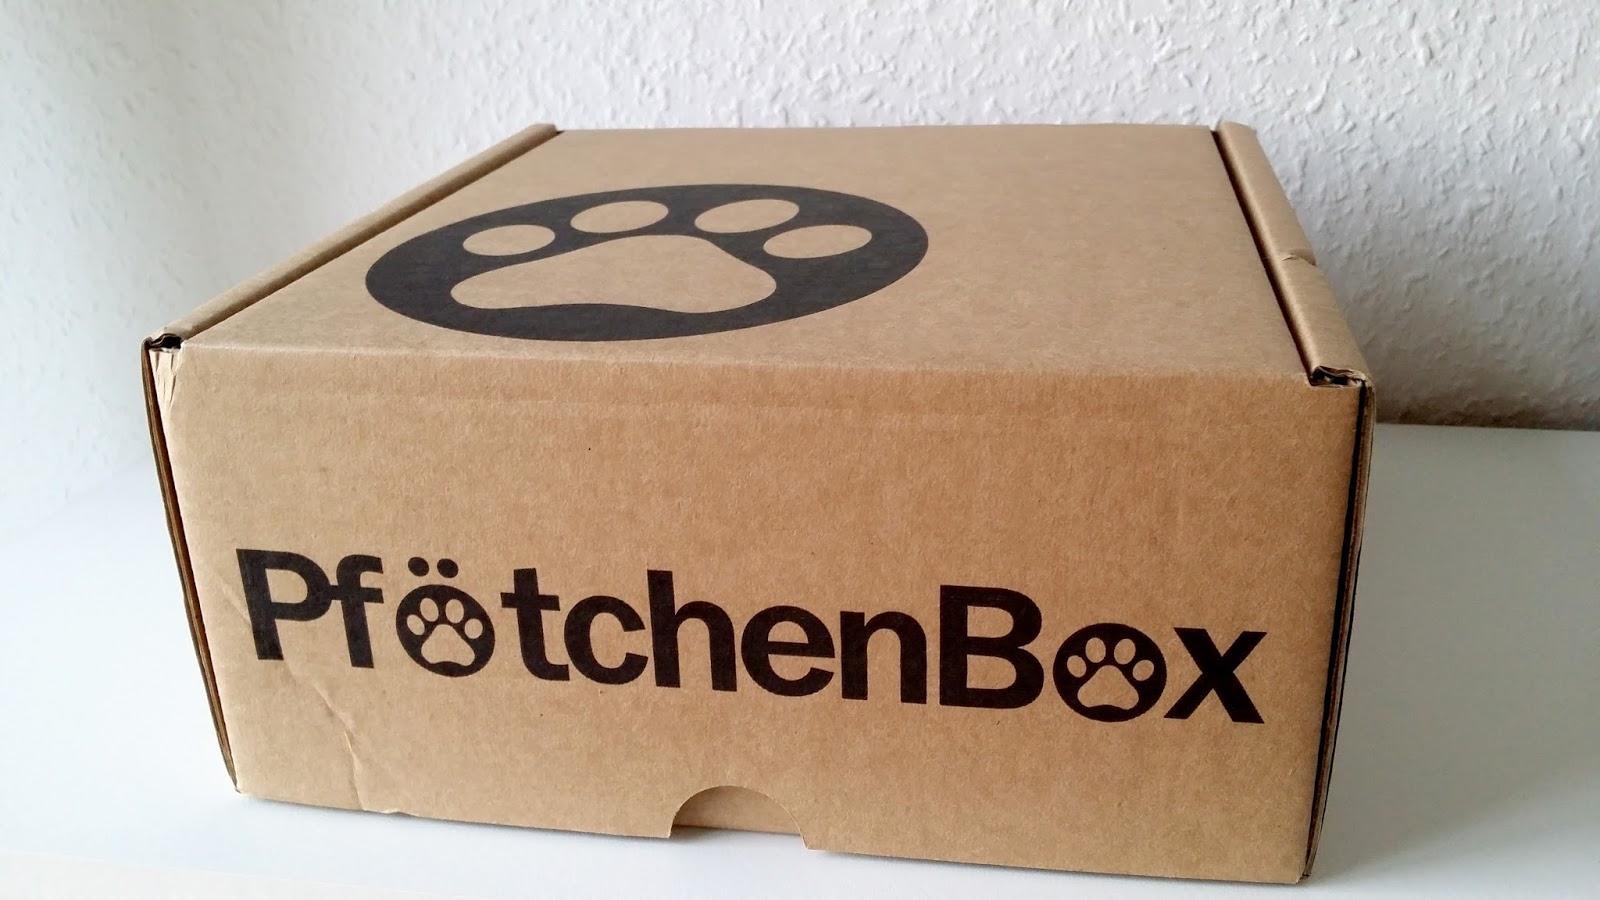 home of taste pf tchenbox und rabattcode f r euch. Black Bedroom Furniture Sets. Home Design Ideas